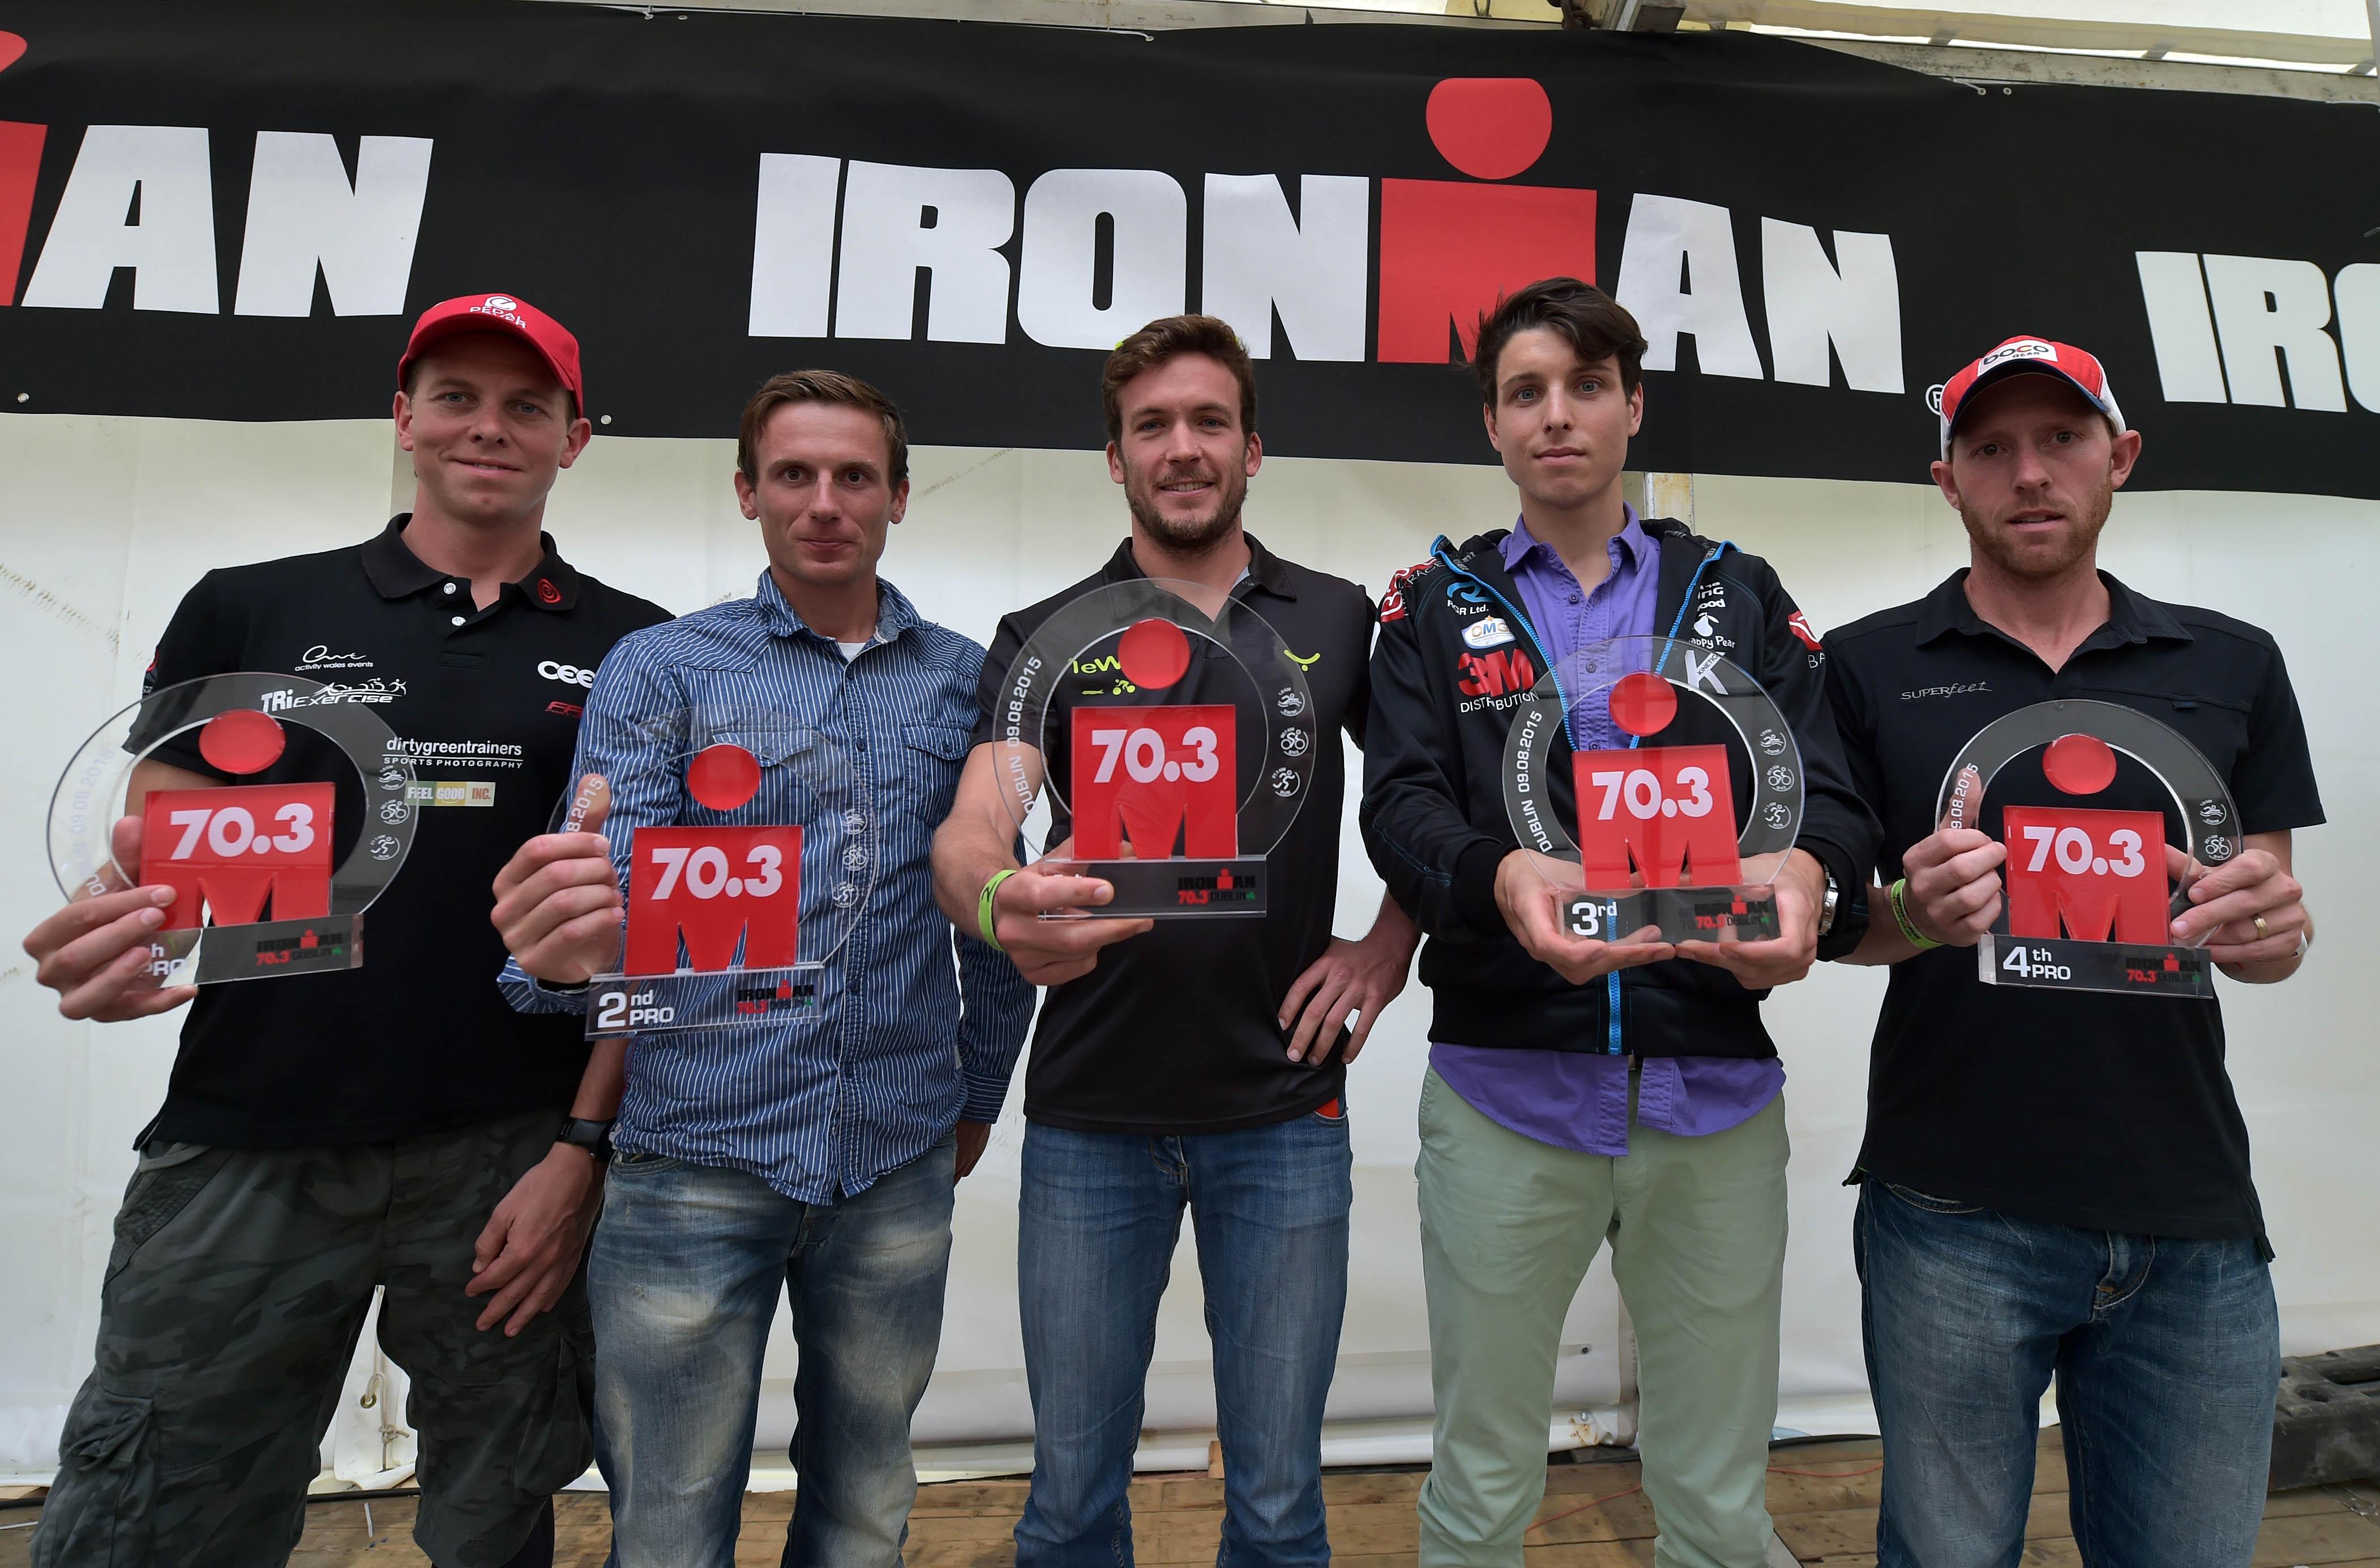 ironman_dublin_prizegiving_2.jpg